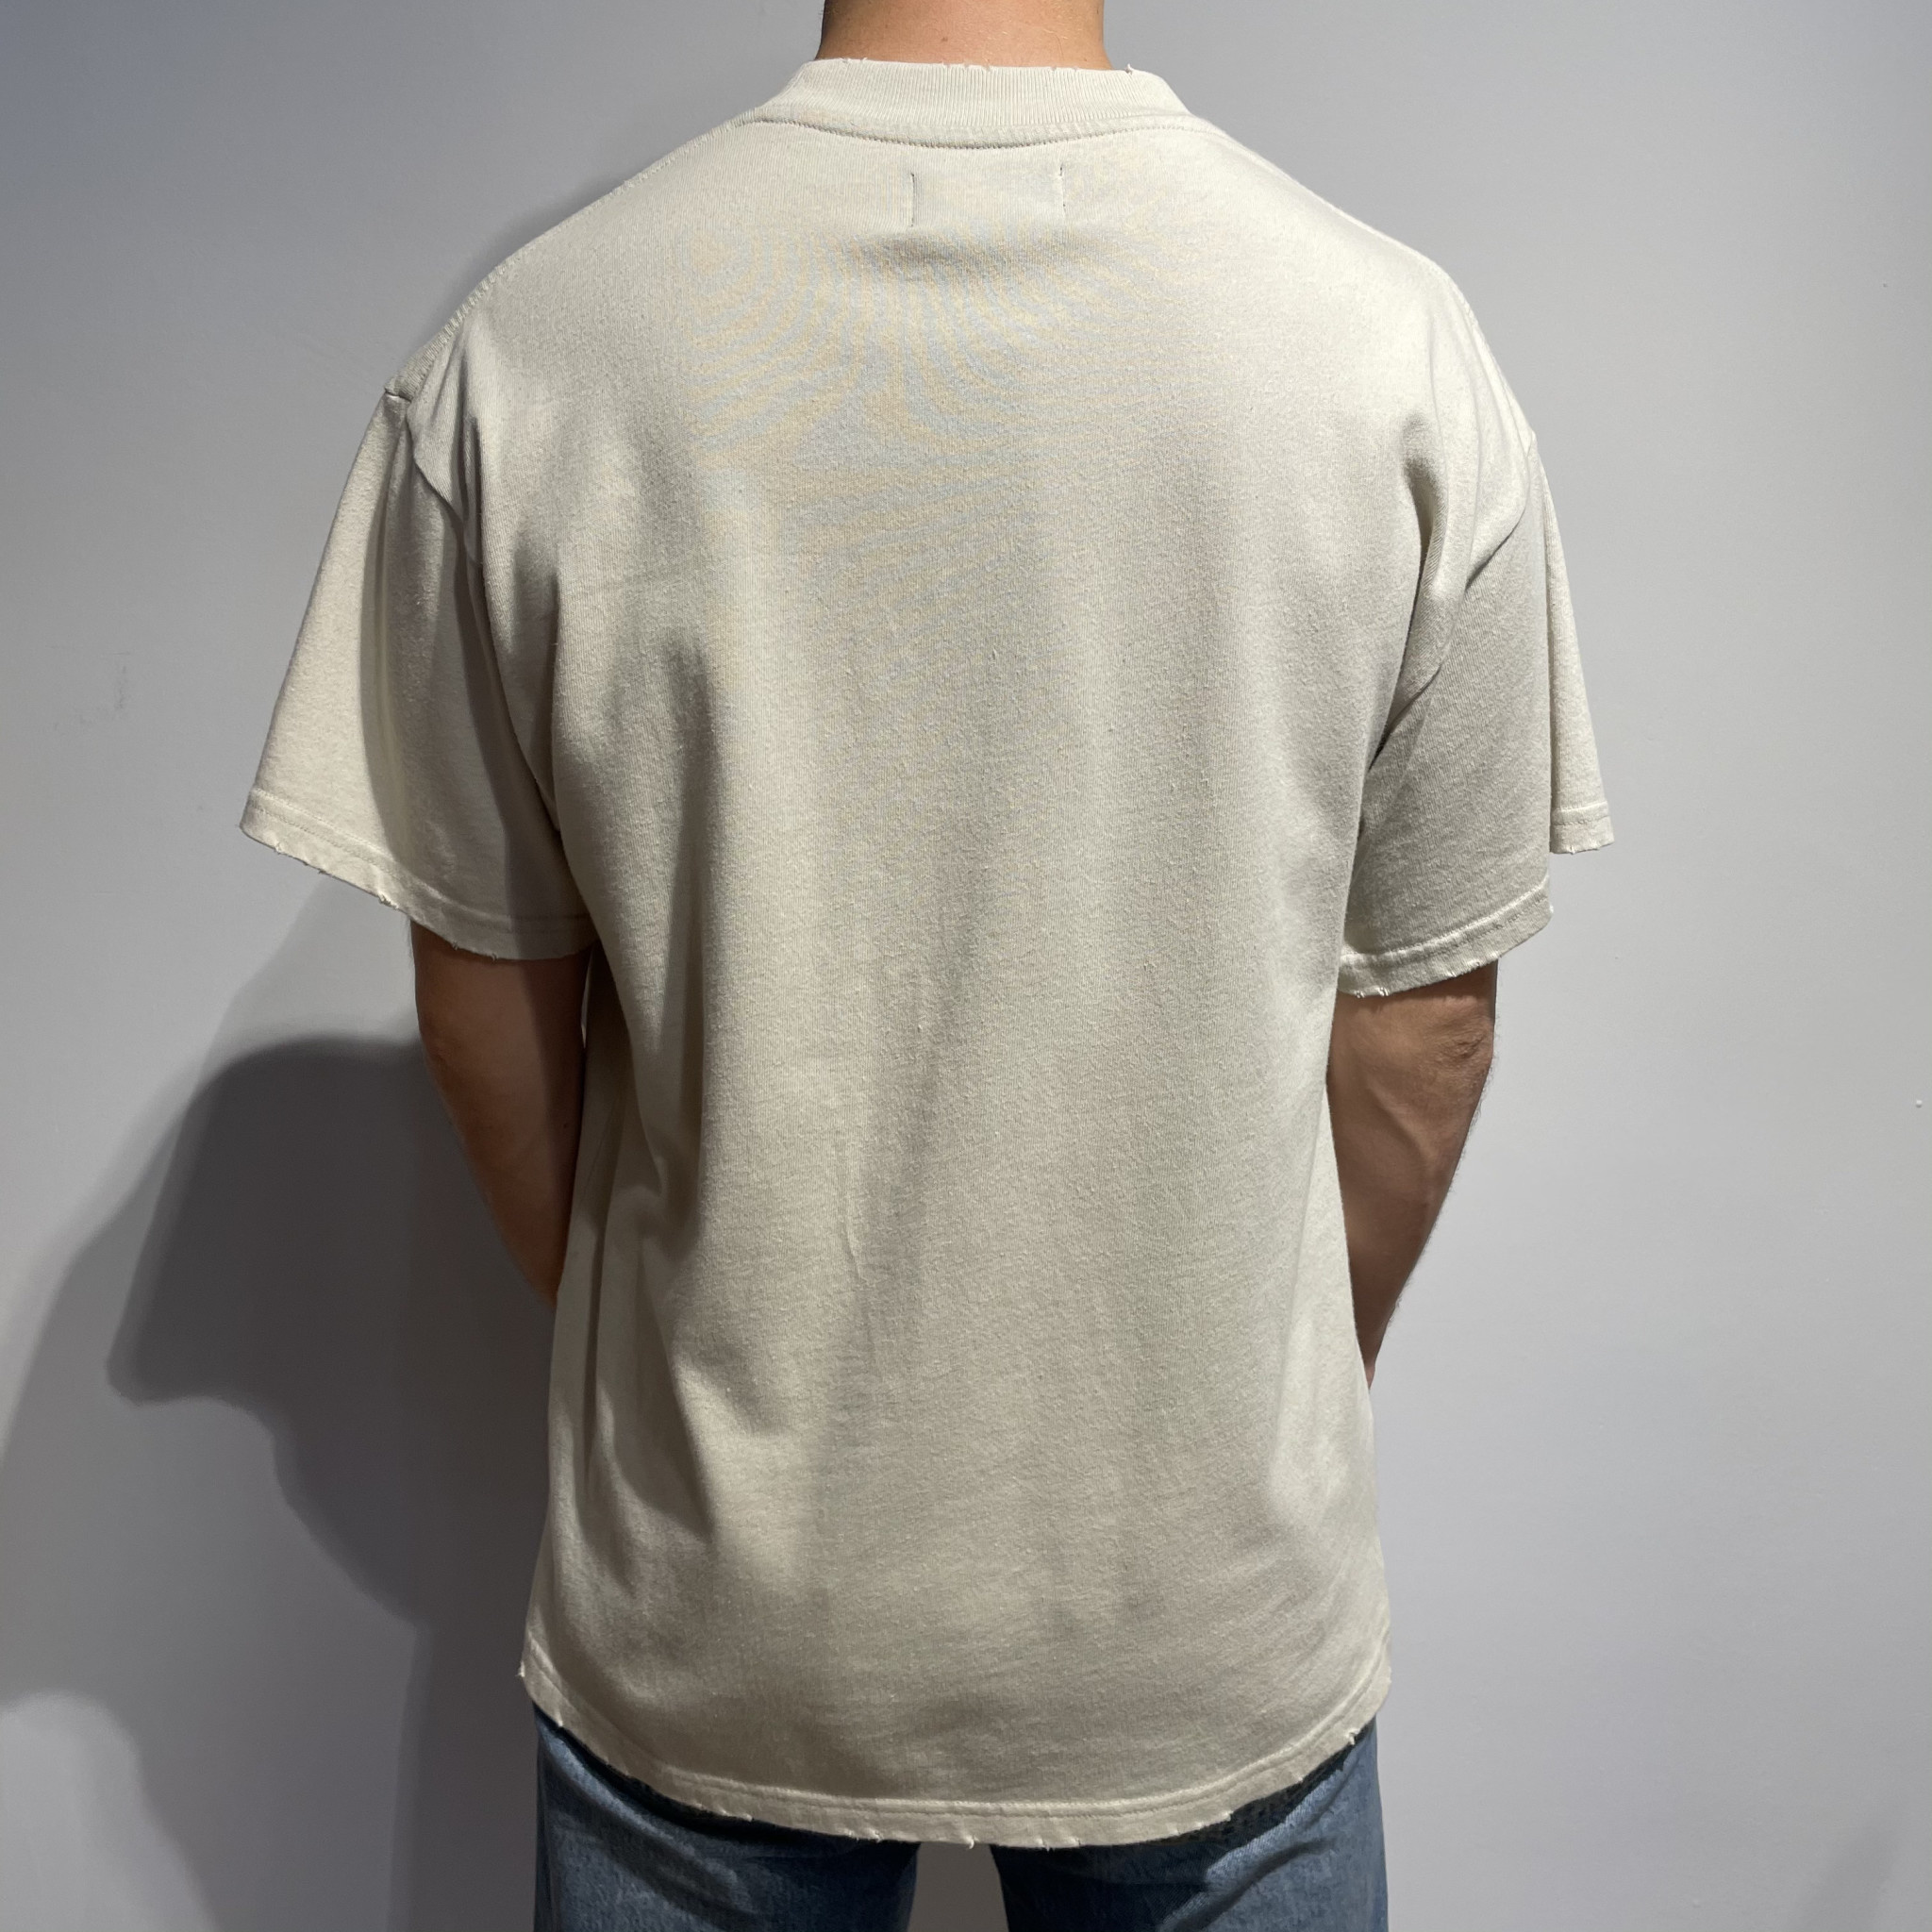 Feel The Heat T-Shirt - Vintage White-2